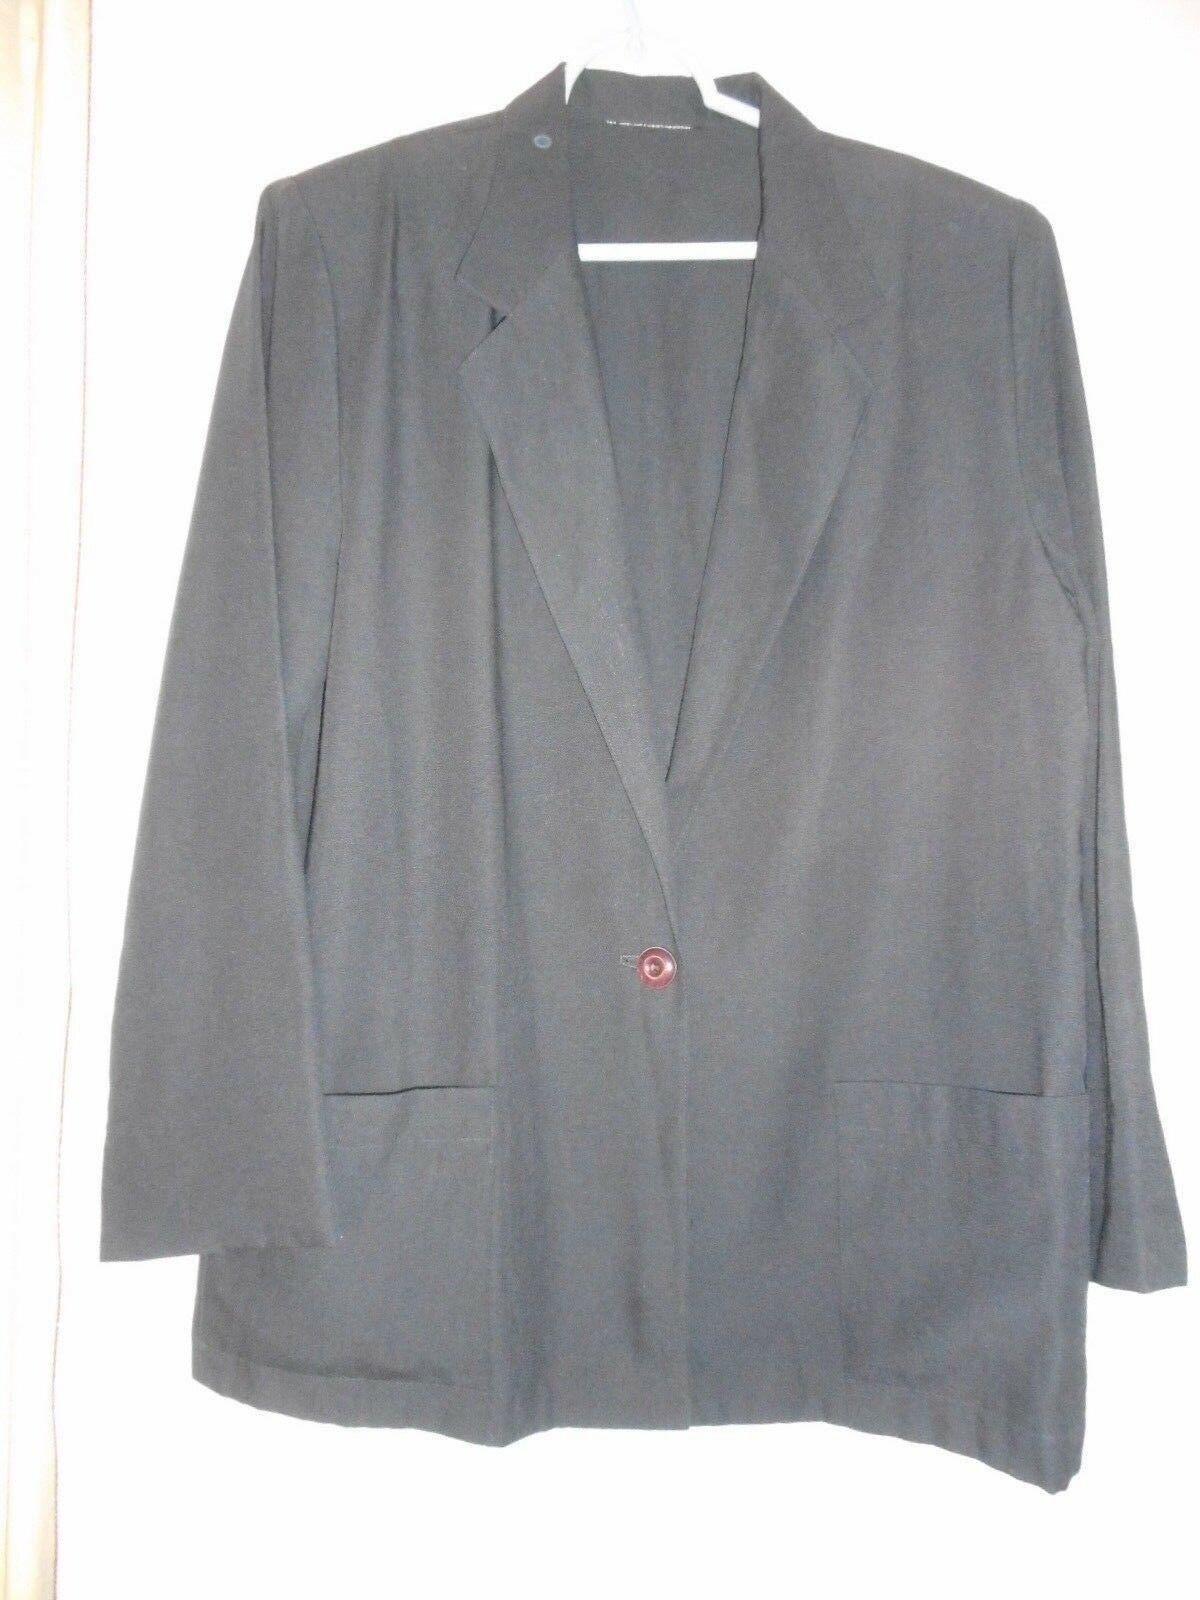 Size 14 Womens Black unLined Blazer Jacket Patch pockets